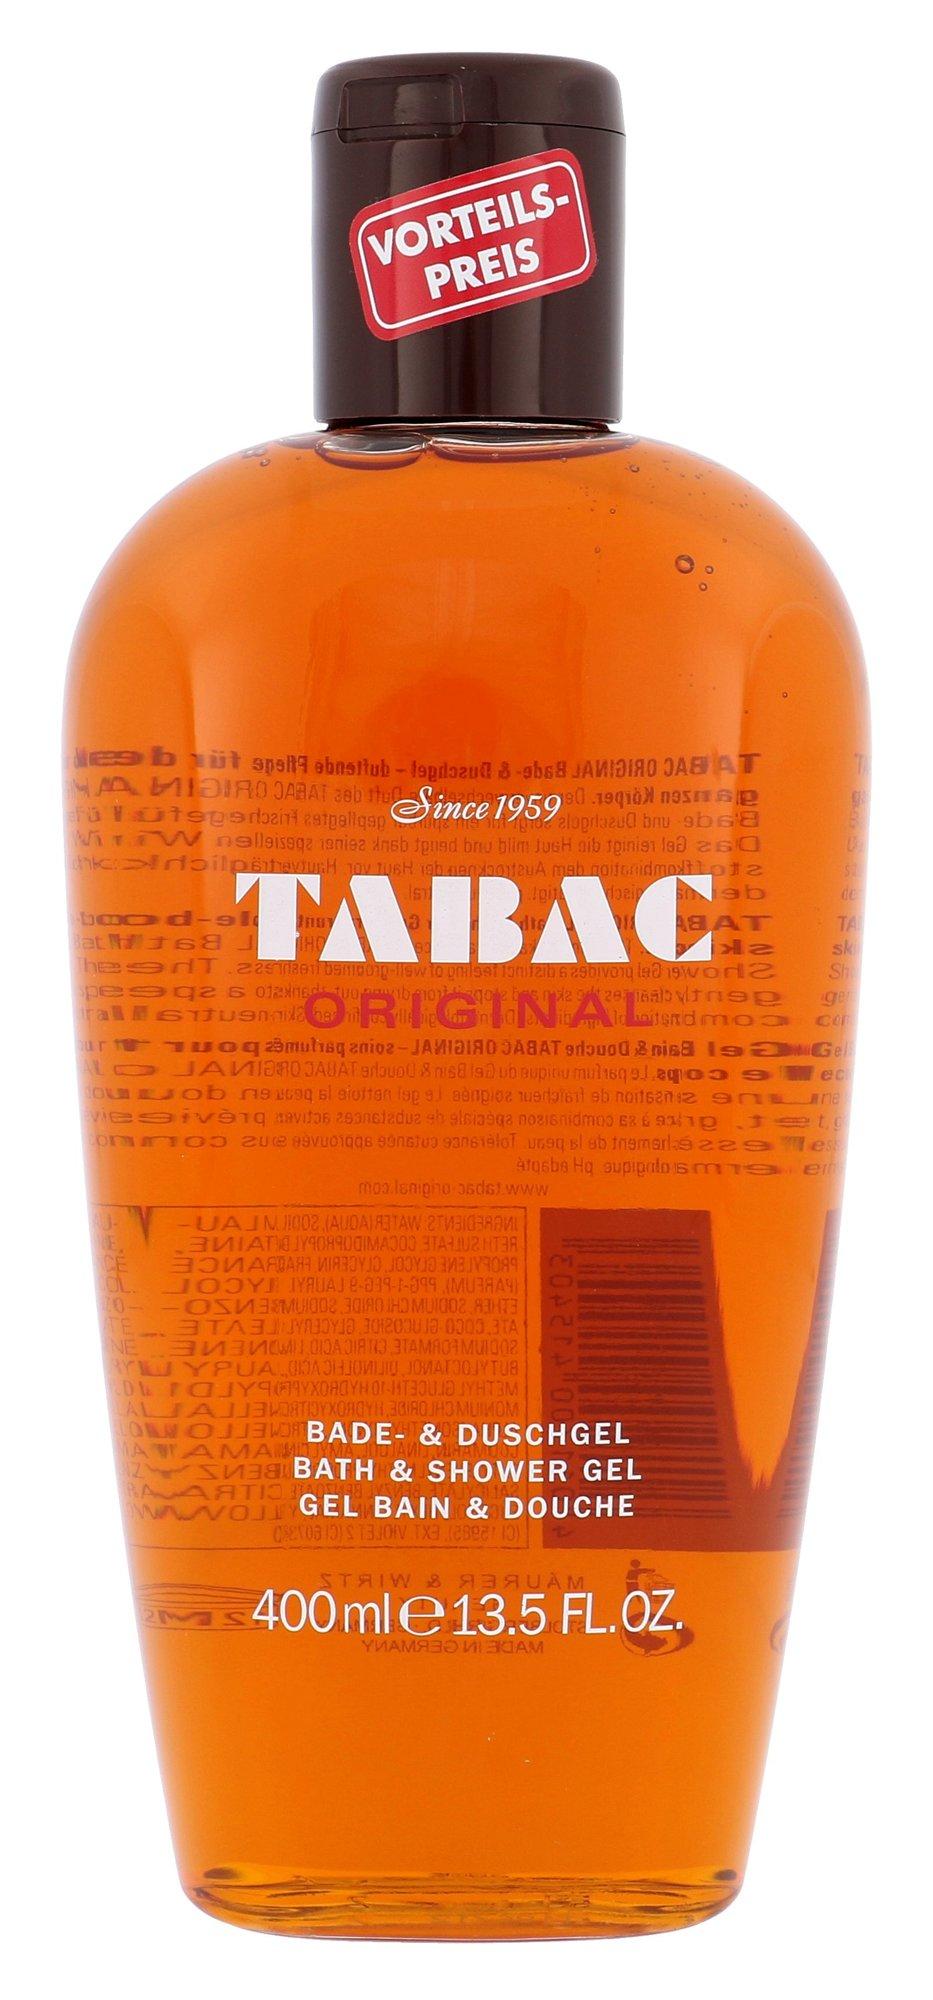 Tabac Original Shower gel 400ml